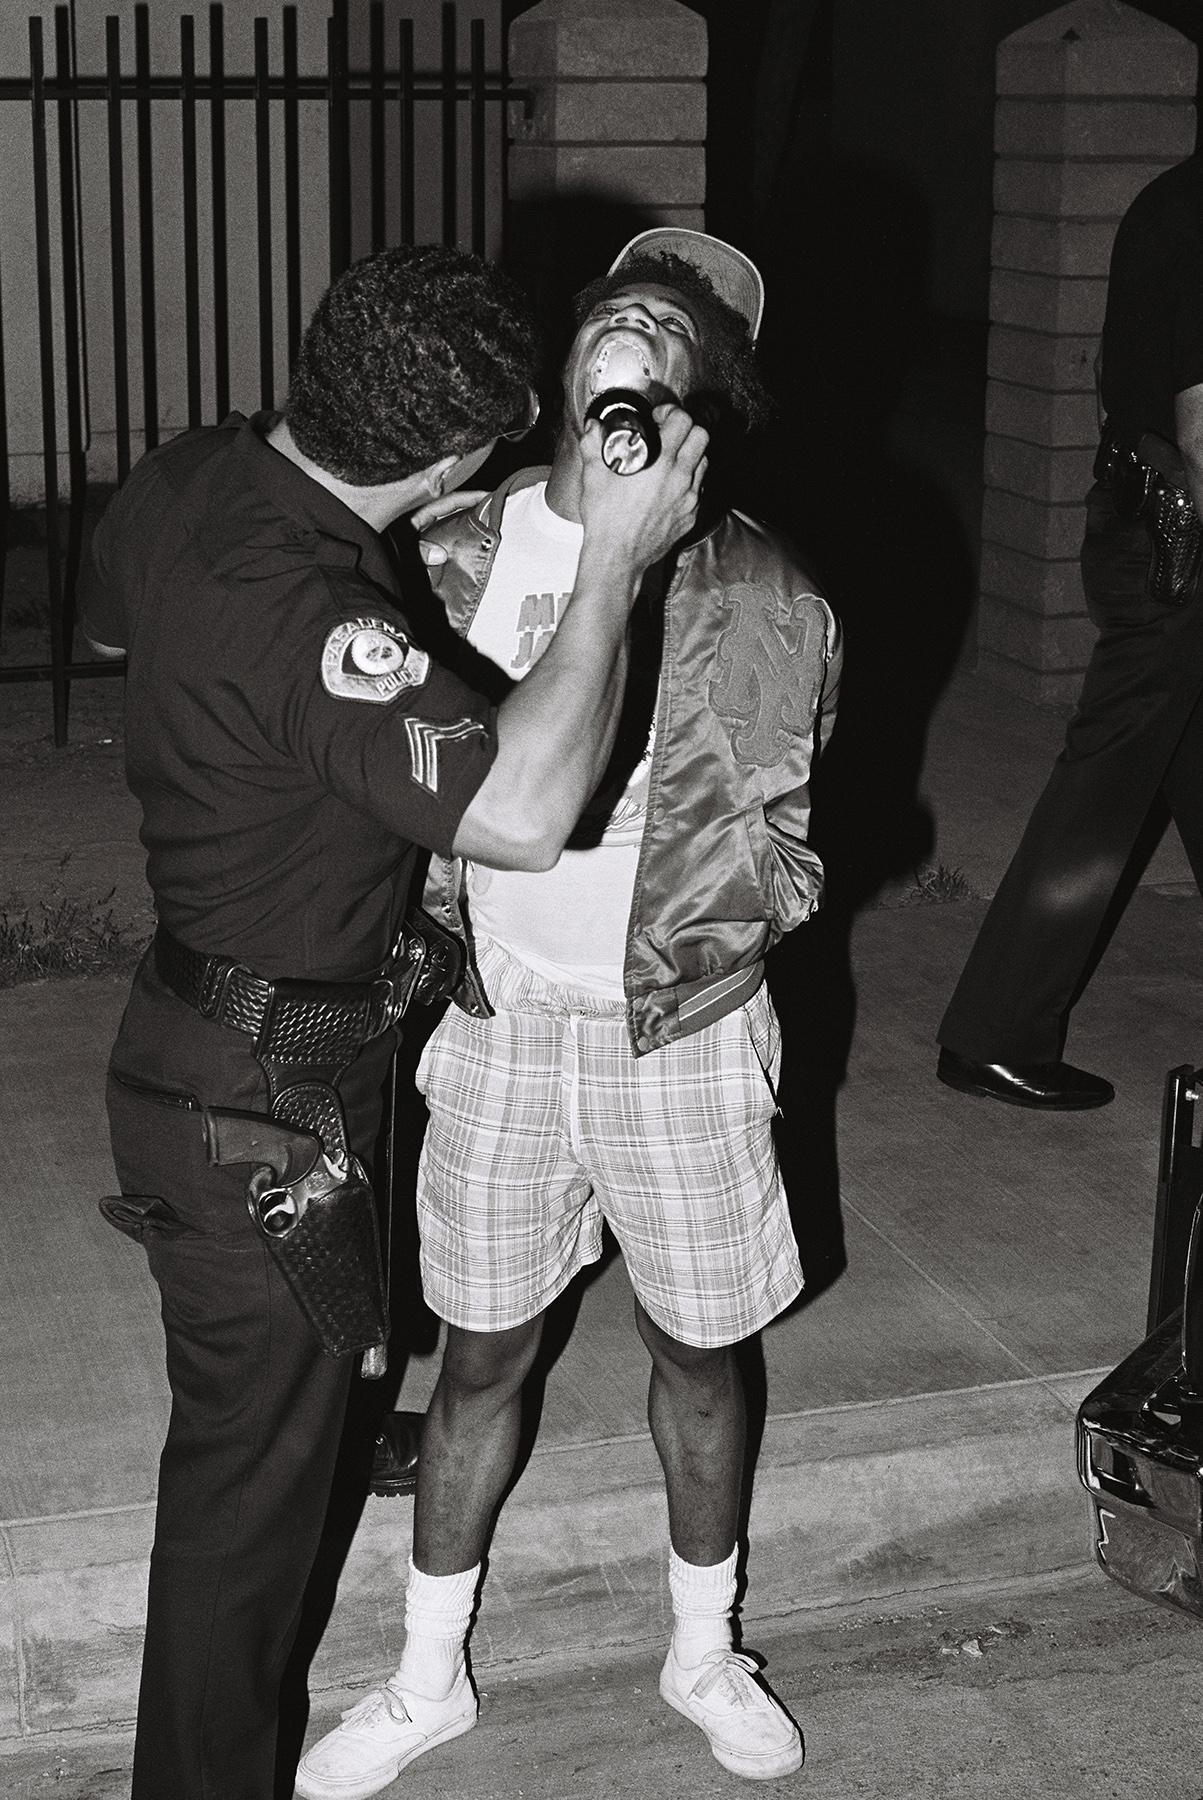 William_Valentine_PasadenaPD_Agent Salgado looking for rock cocaine_4.jpg